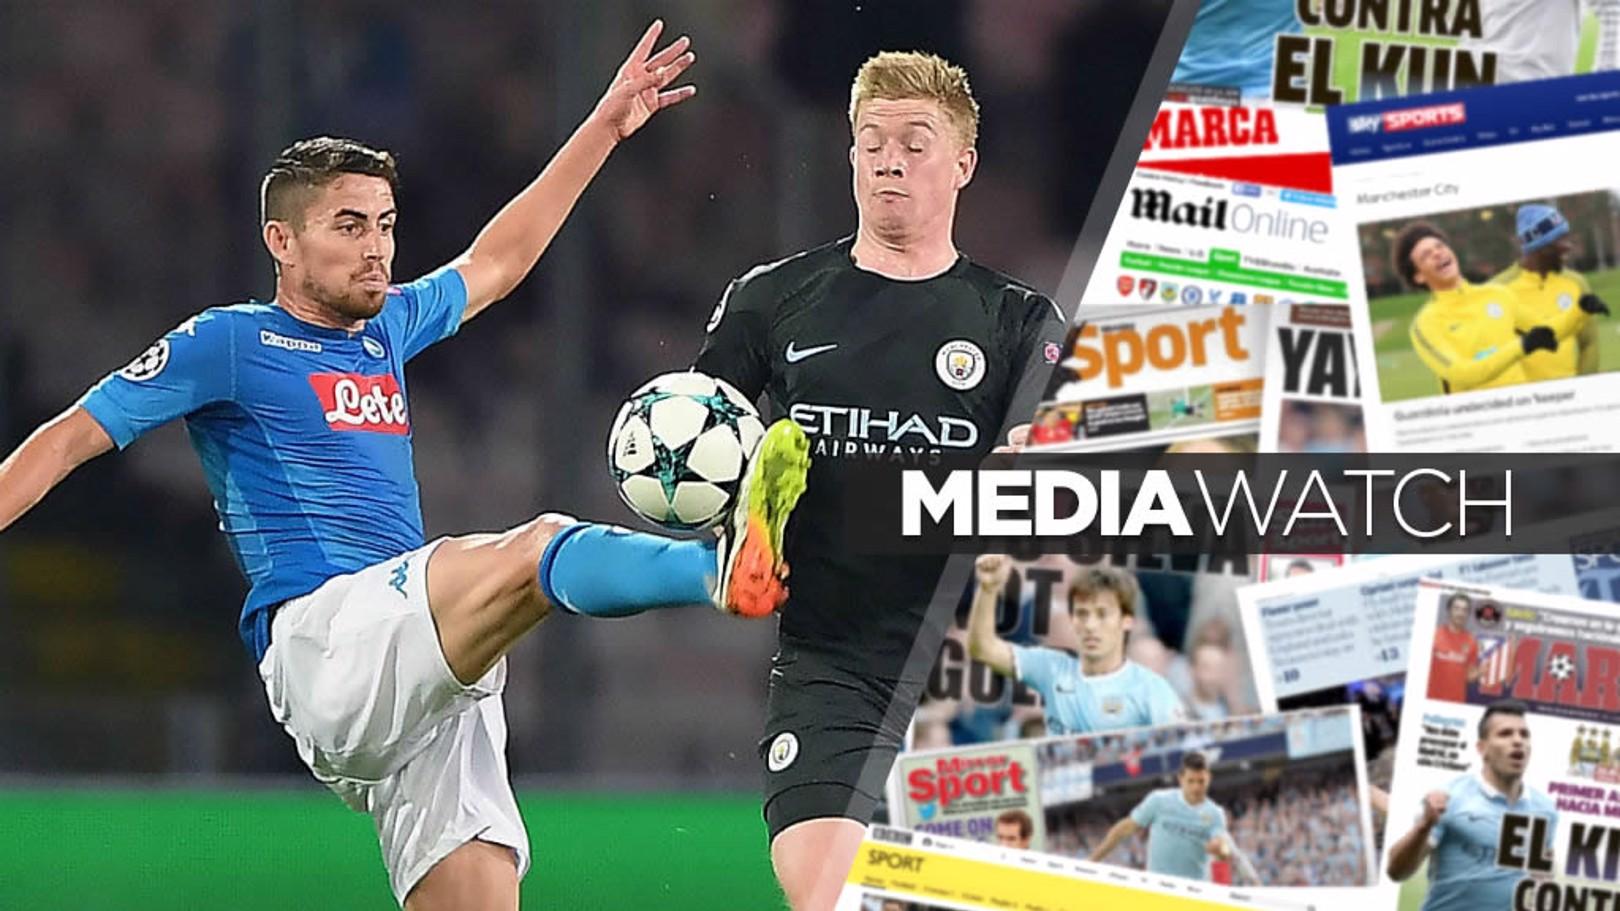 صحف تربط مانشستر سيتي بالتحرك لضم جورجينيو.